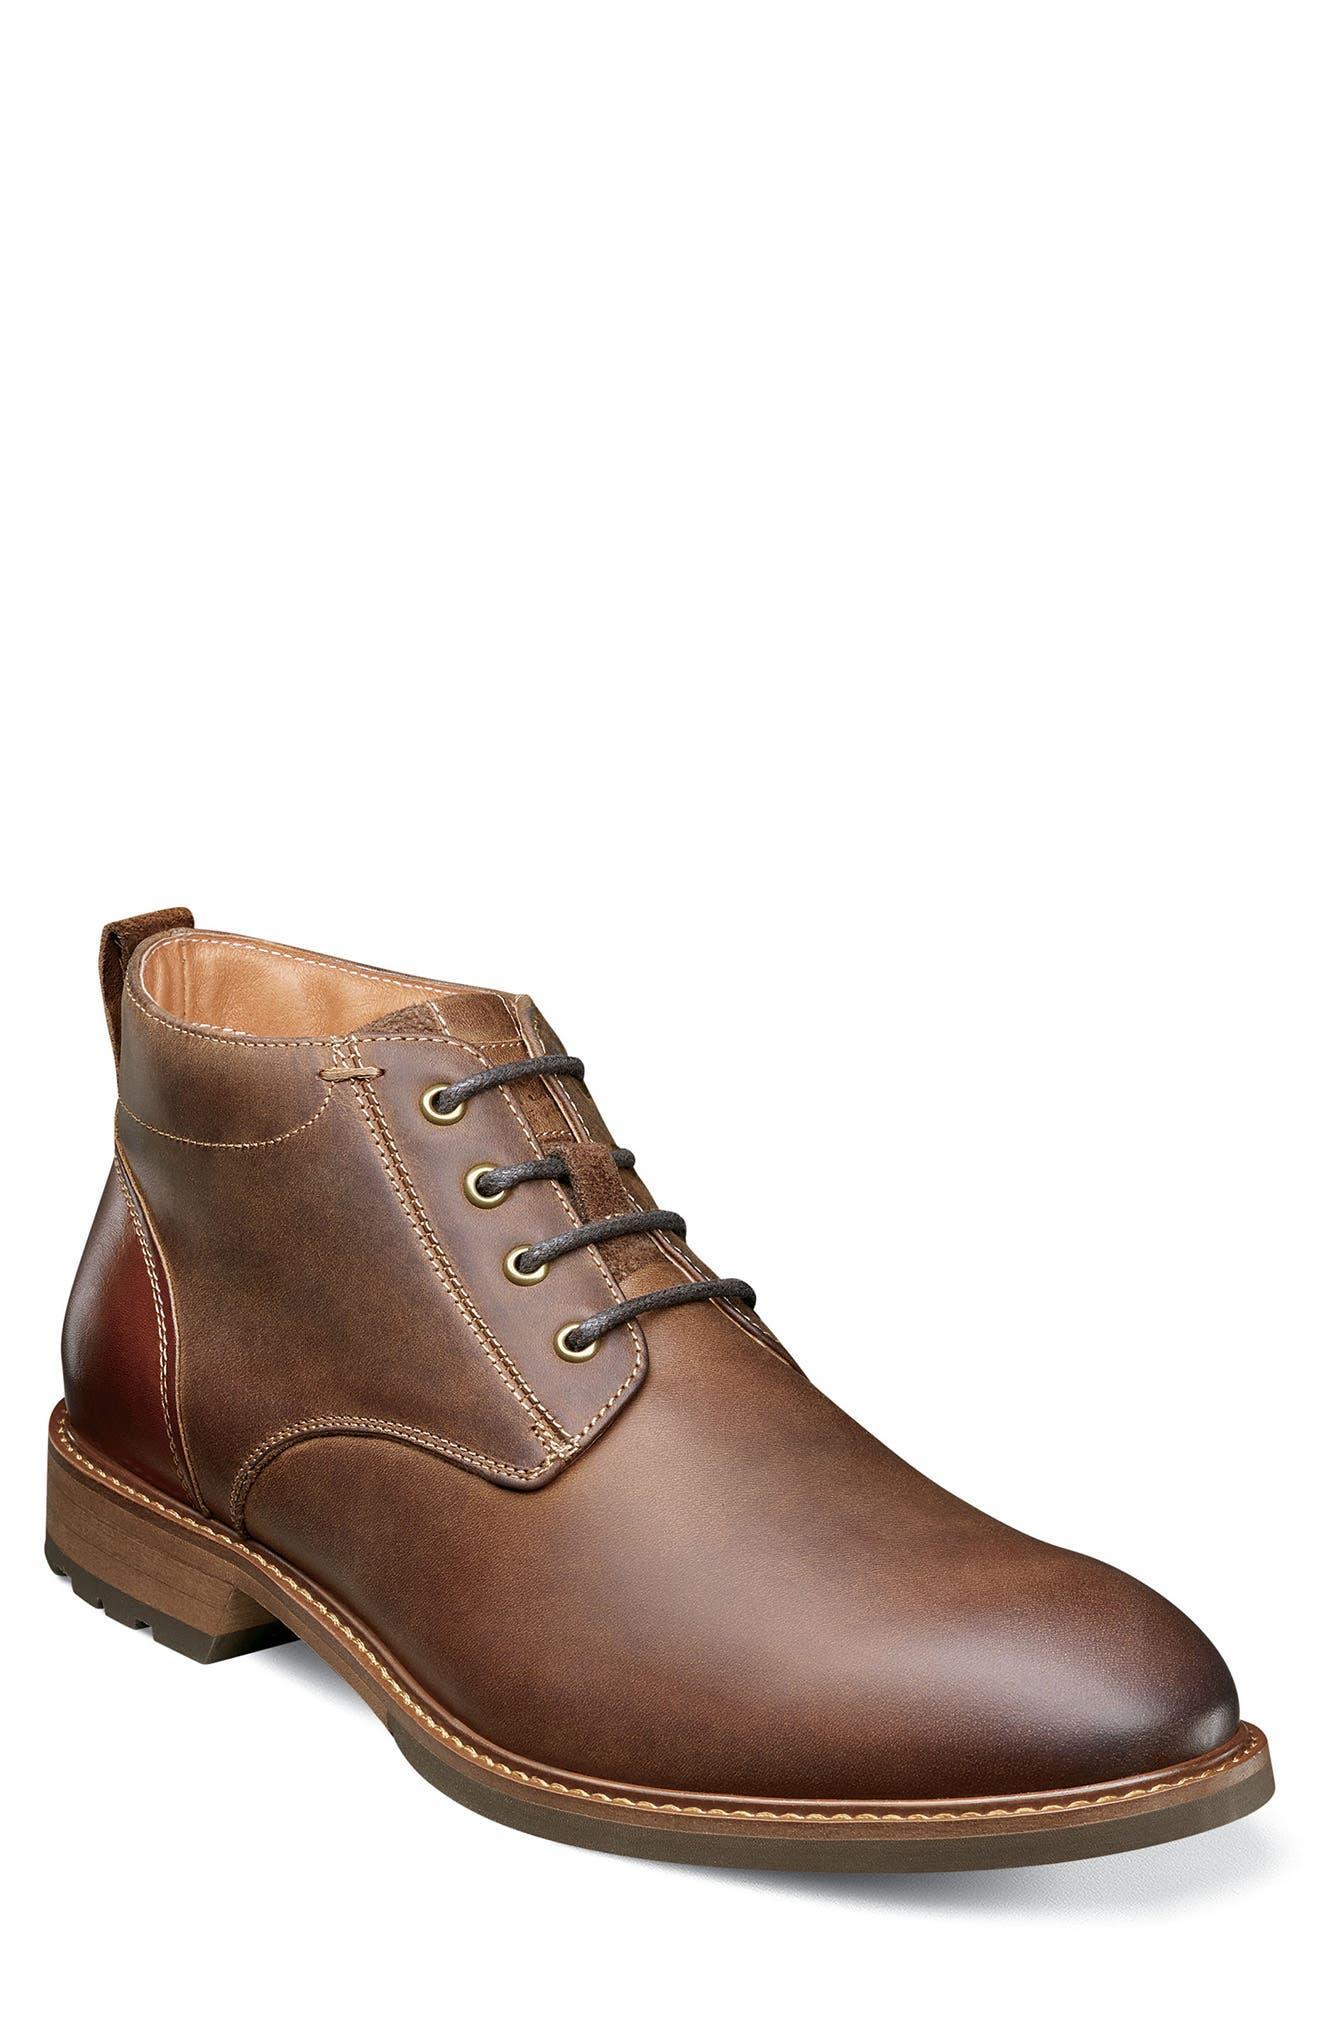 Lodge Plain Toe Boot